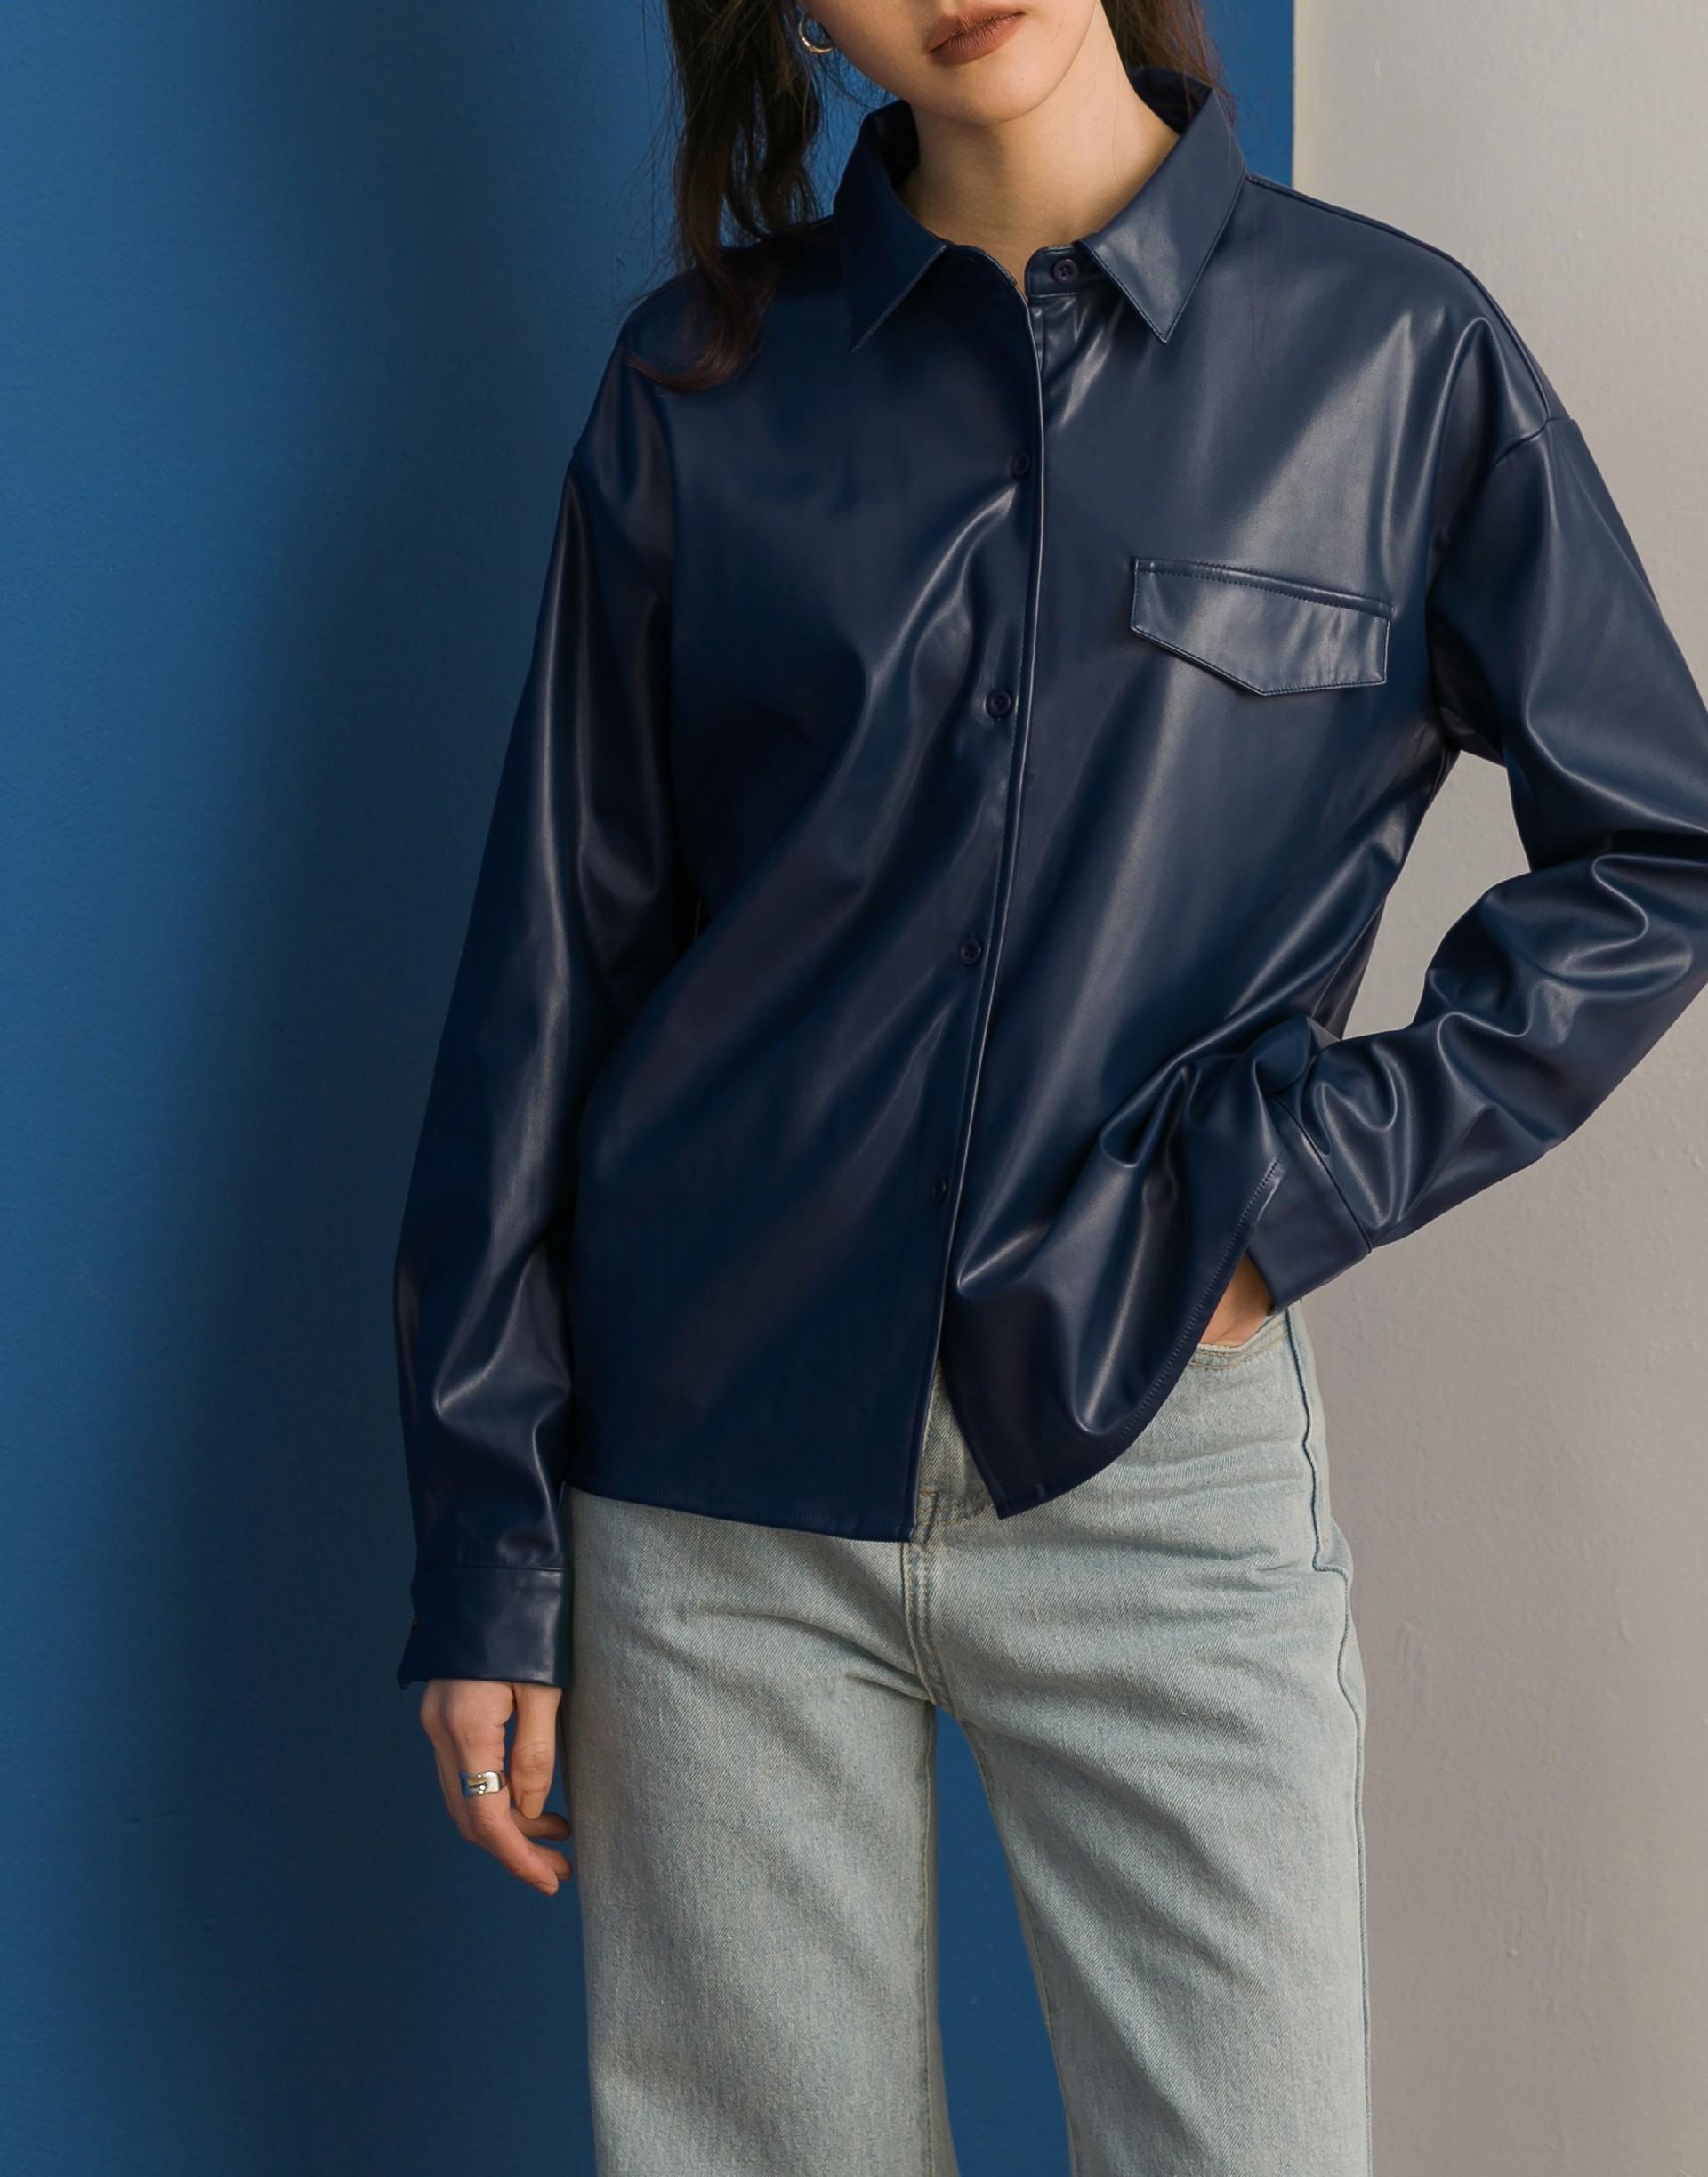 Textured Leather皮革襯衫-女-Genquo